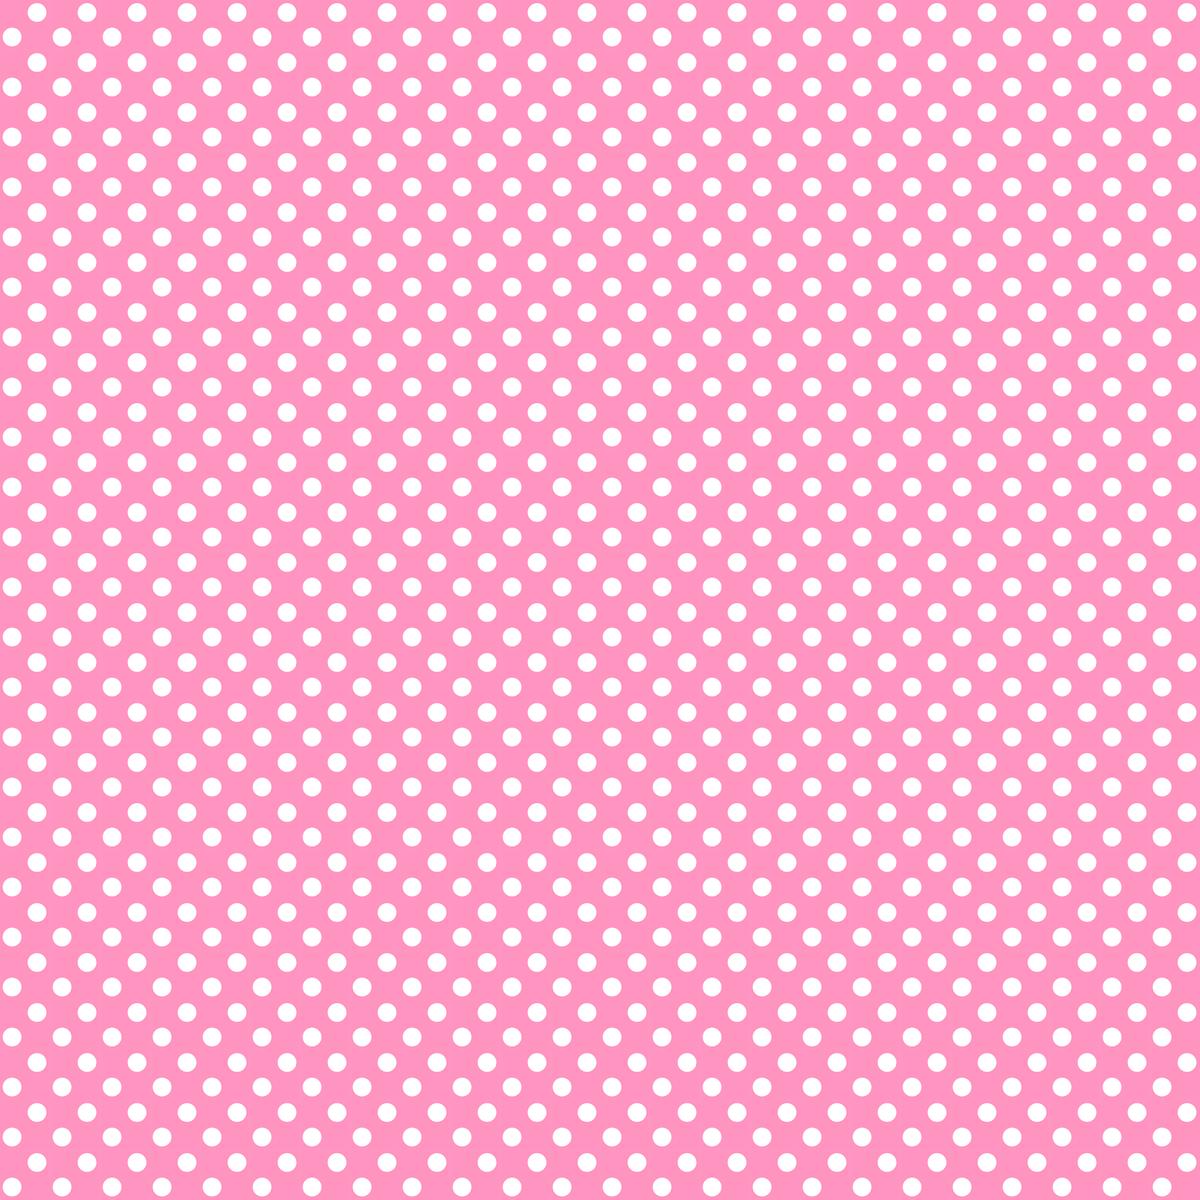 6 Images of Light Pink Polka Dot Paper Printable